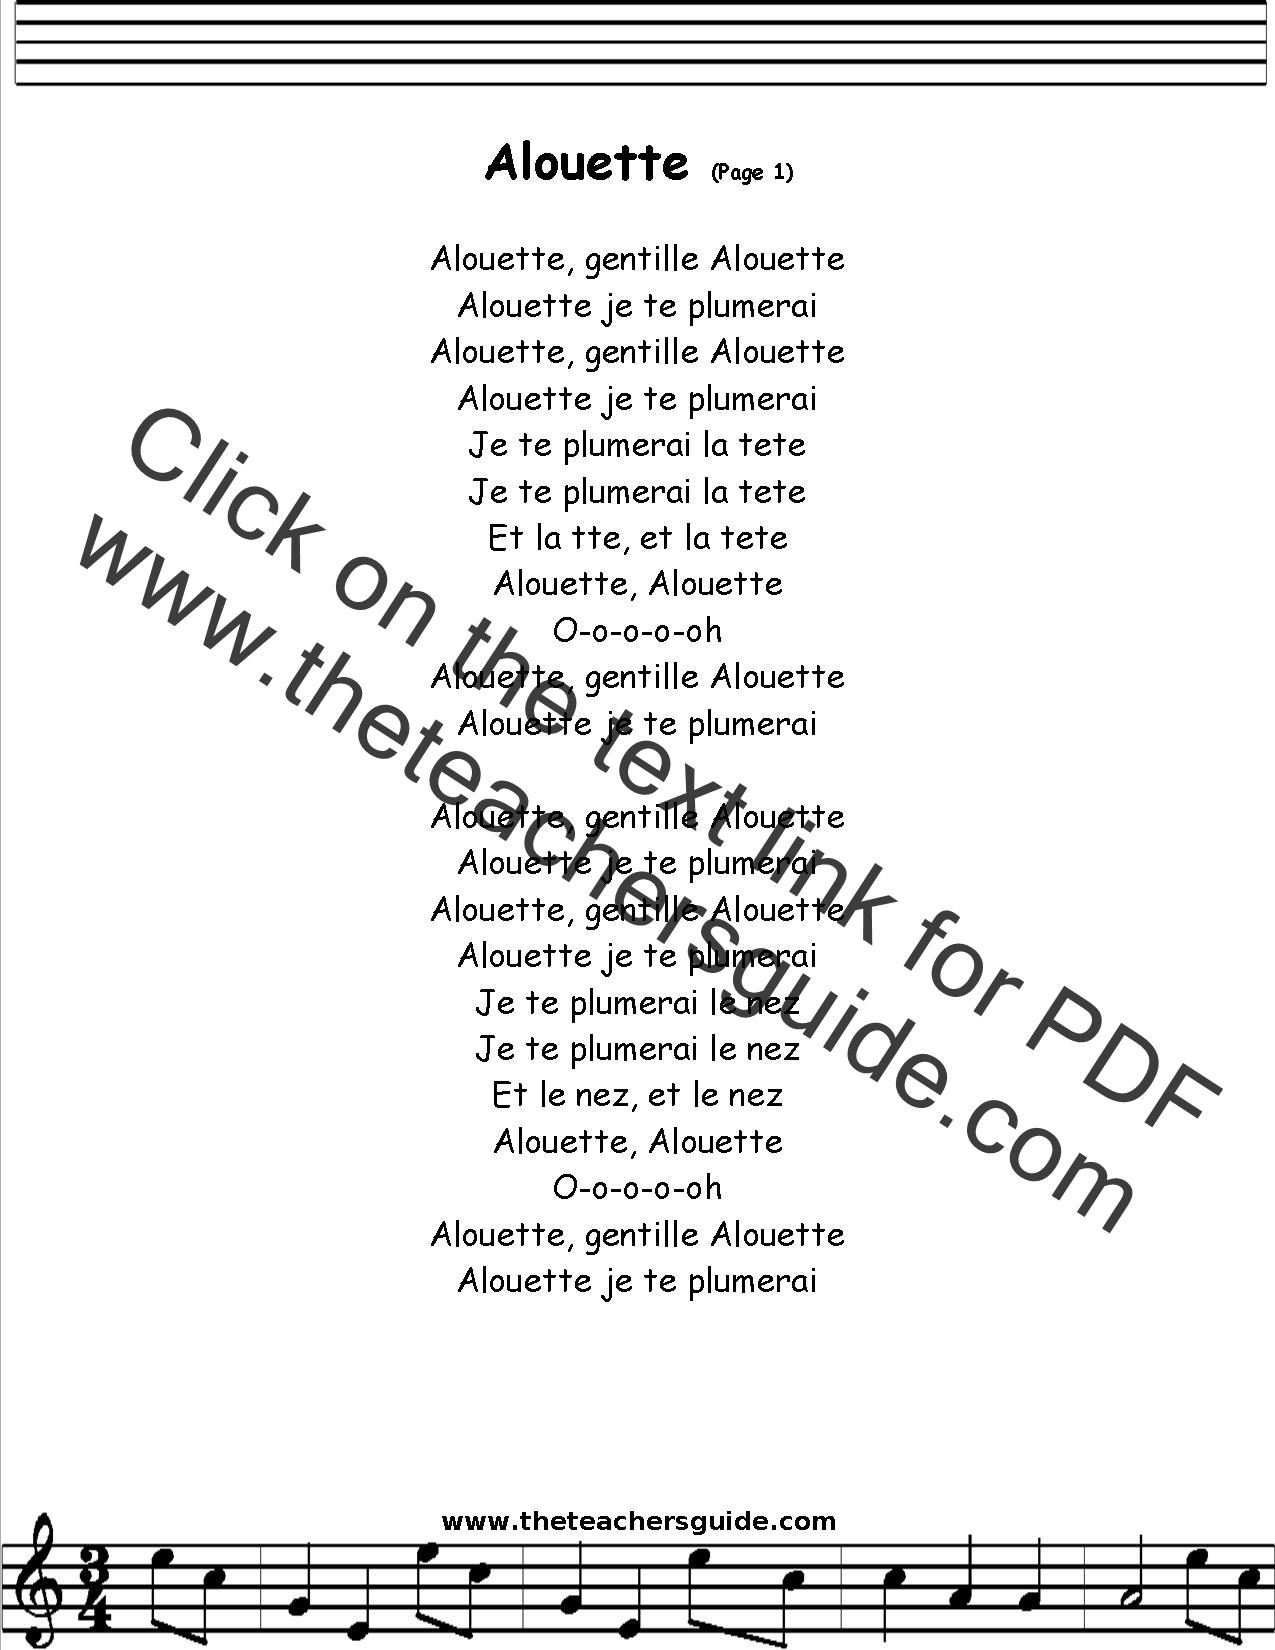 Alouette (song) - Wikipedia